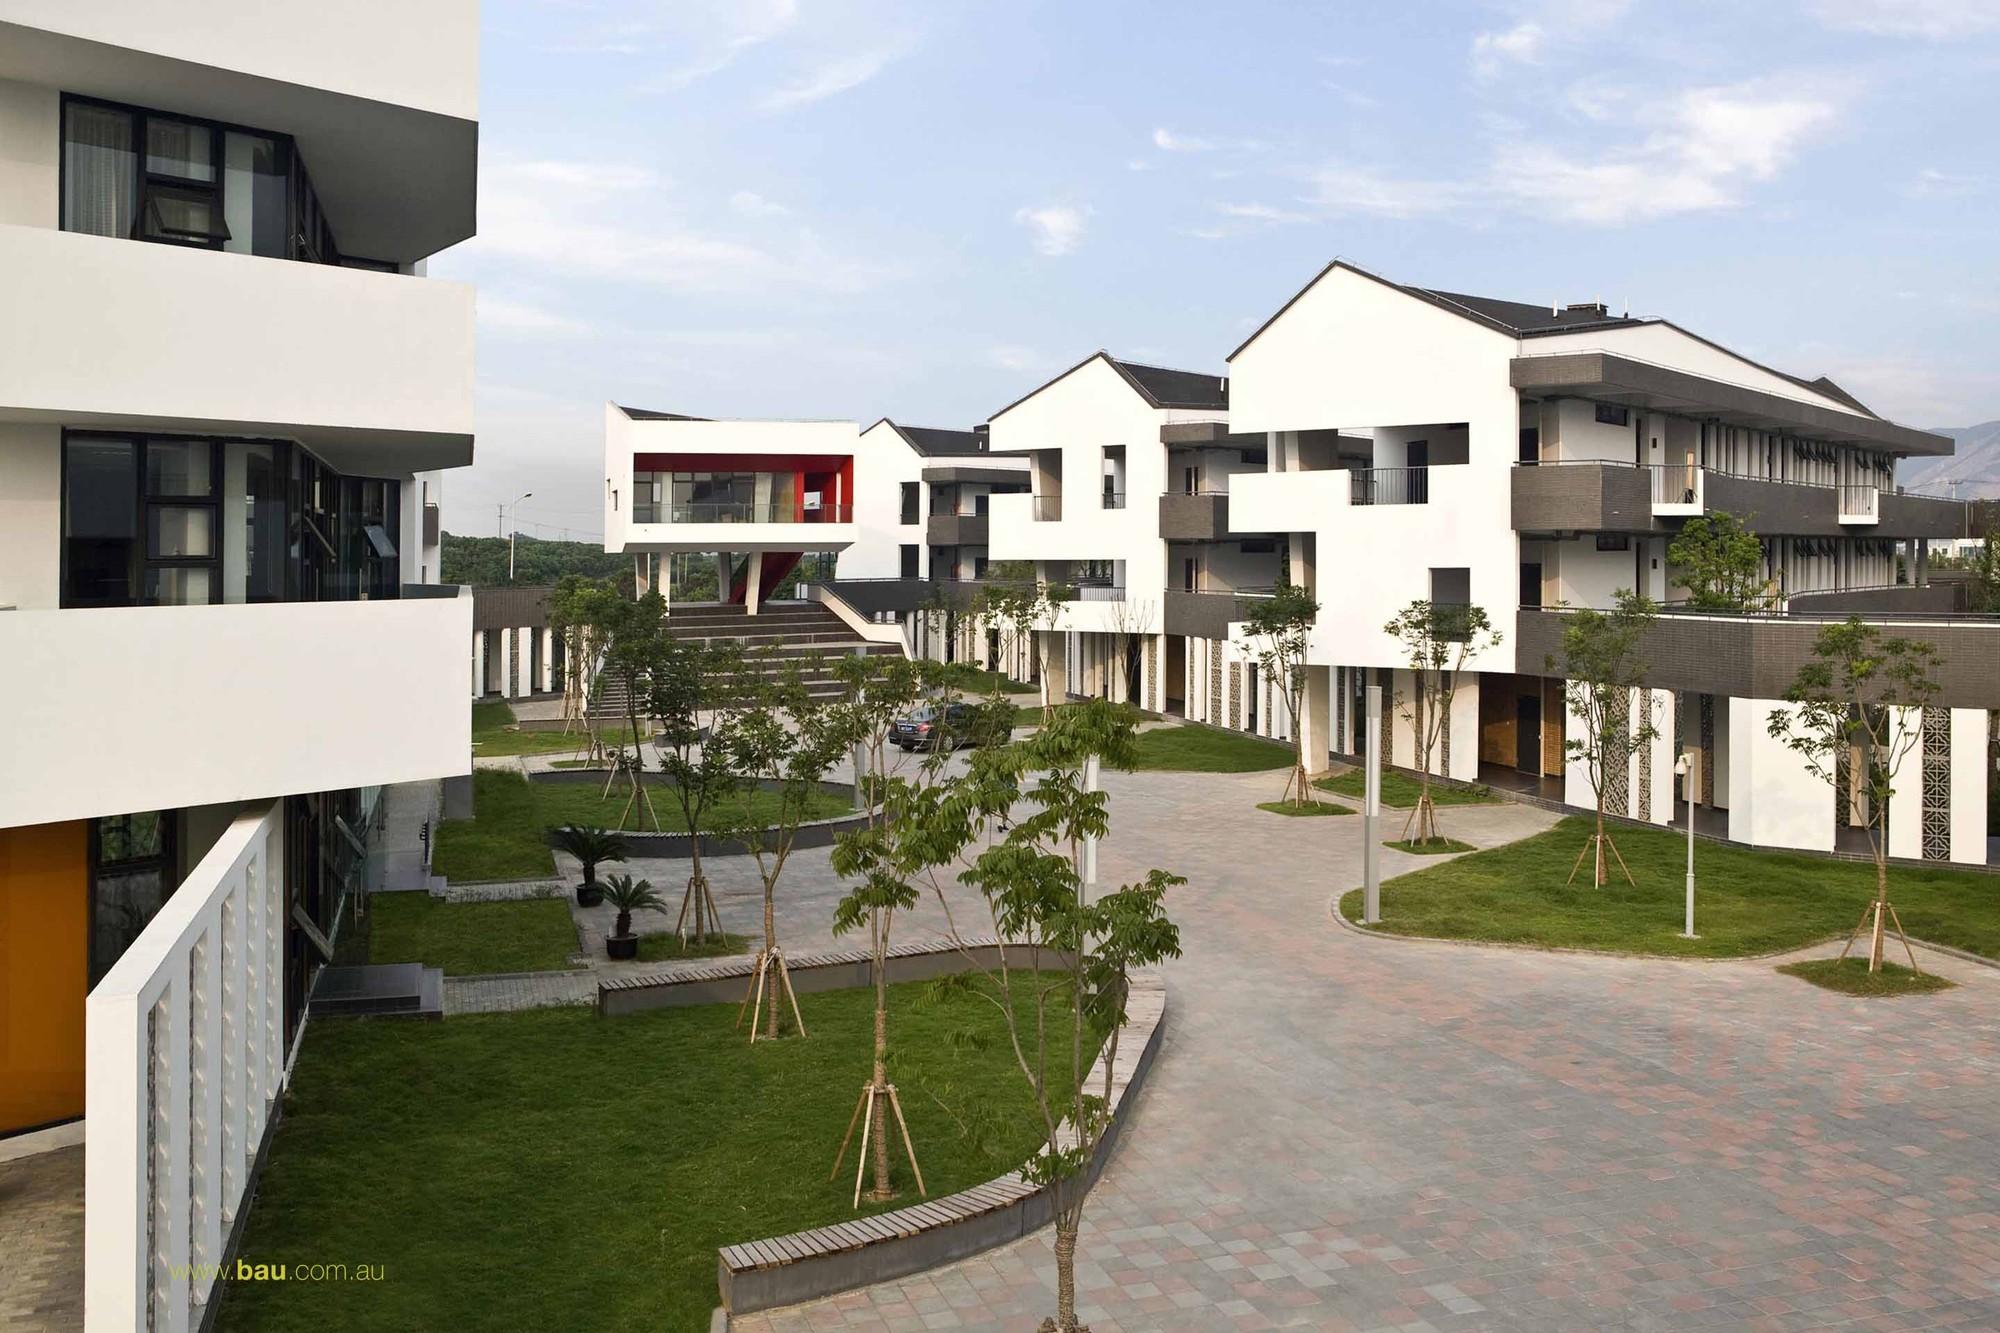 Suzhou School / BAU Brearley Architects + Urbanists, © Shu He